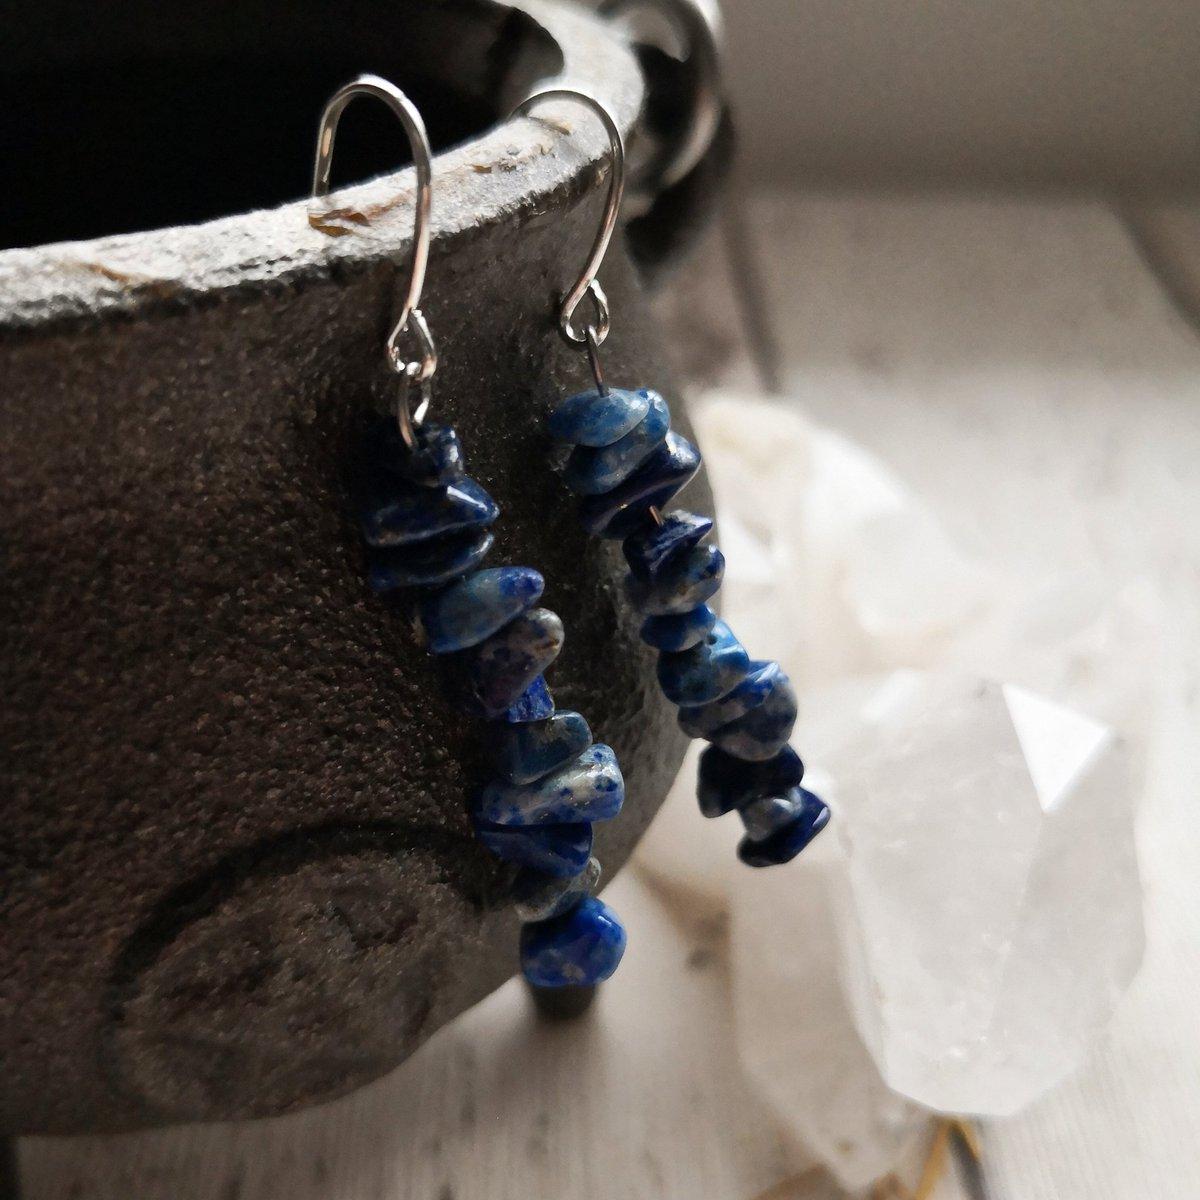 Lapis lazuli pillar dangle earrings.  #lapislazuli #gemstones #gemstonejewelry #gems #earringlover #earringlove #prettylittlethings #crystalenergy #crystalhealing #elven #boho #larp #witch #dangleearrings #igdaily #instapic #photooftheday #igphoto #devonartist #devoncrafts #blue